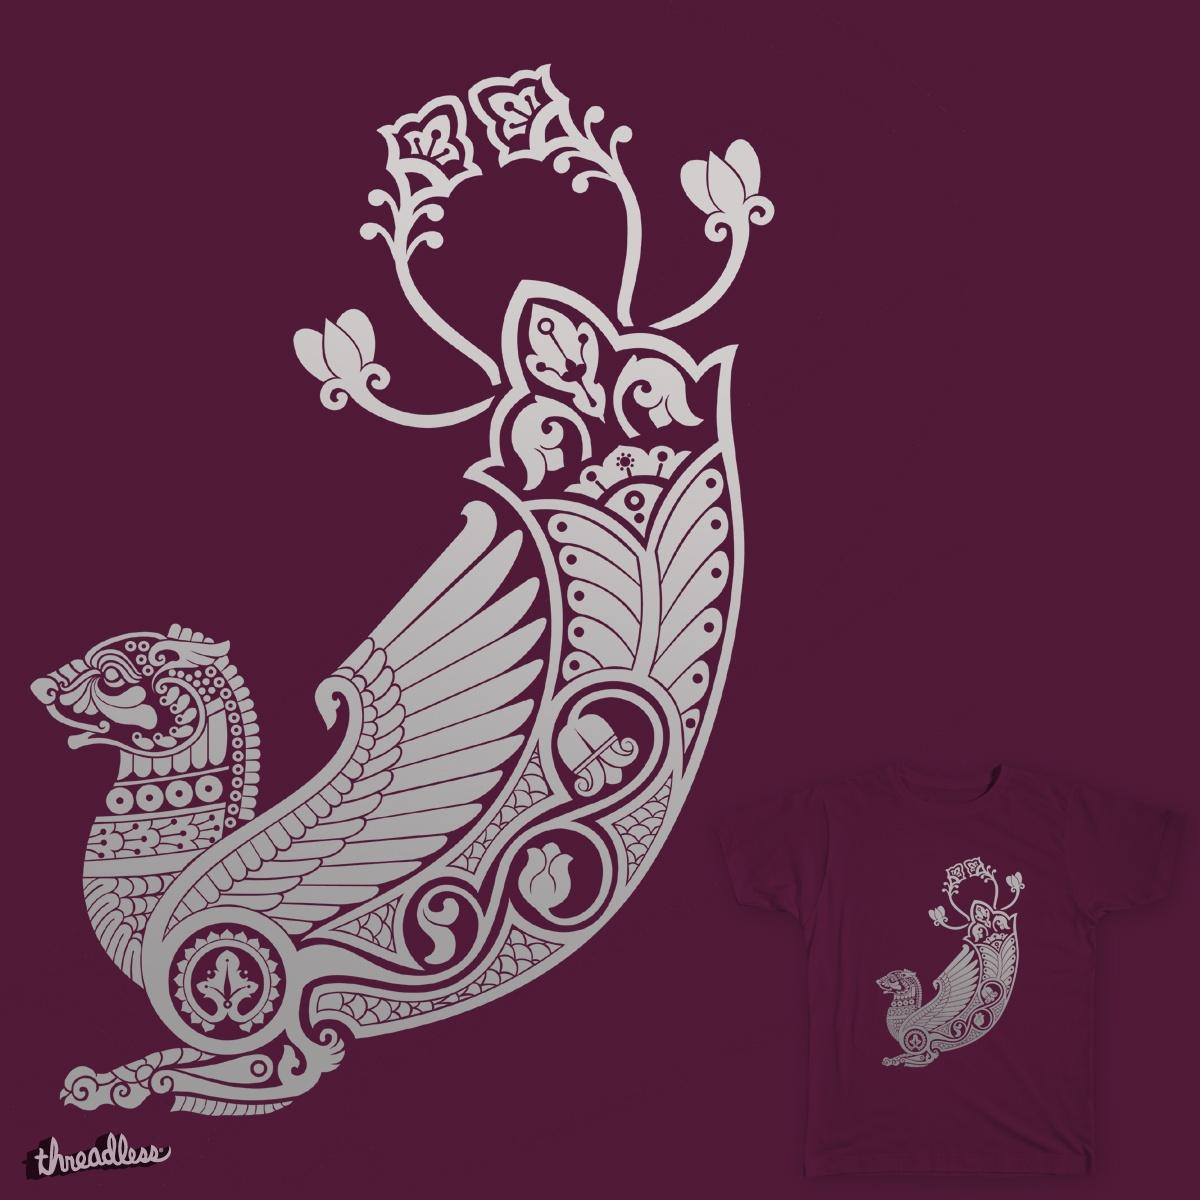 Simurgh by Verreaux on Threadless